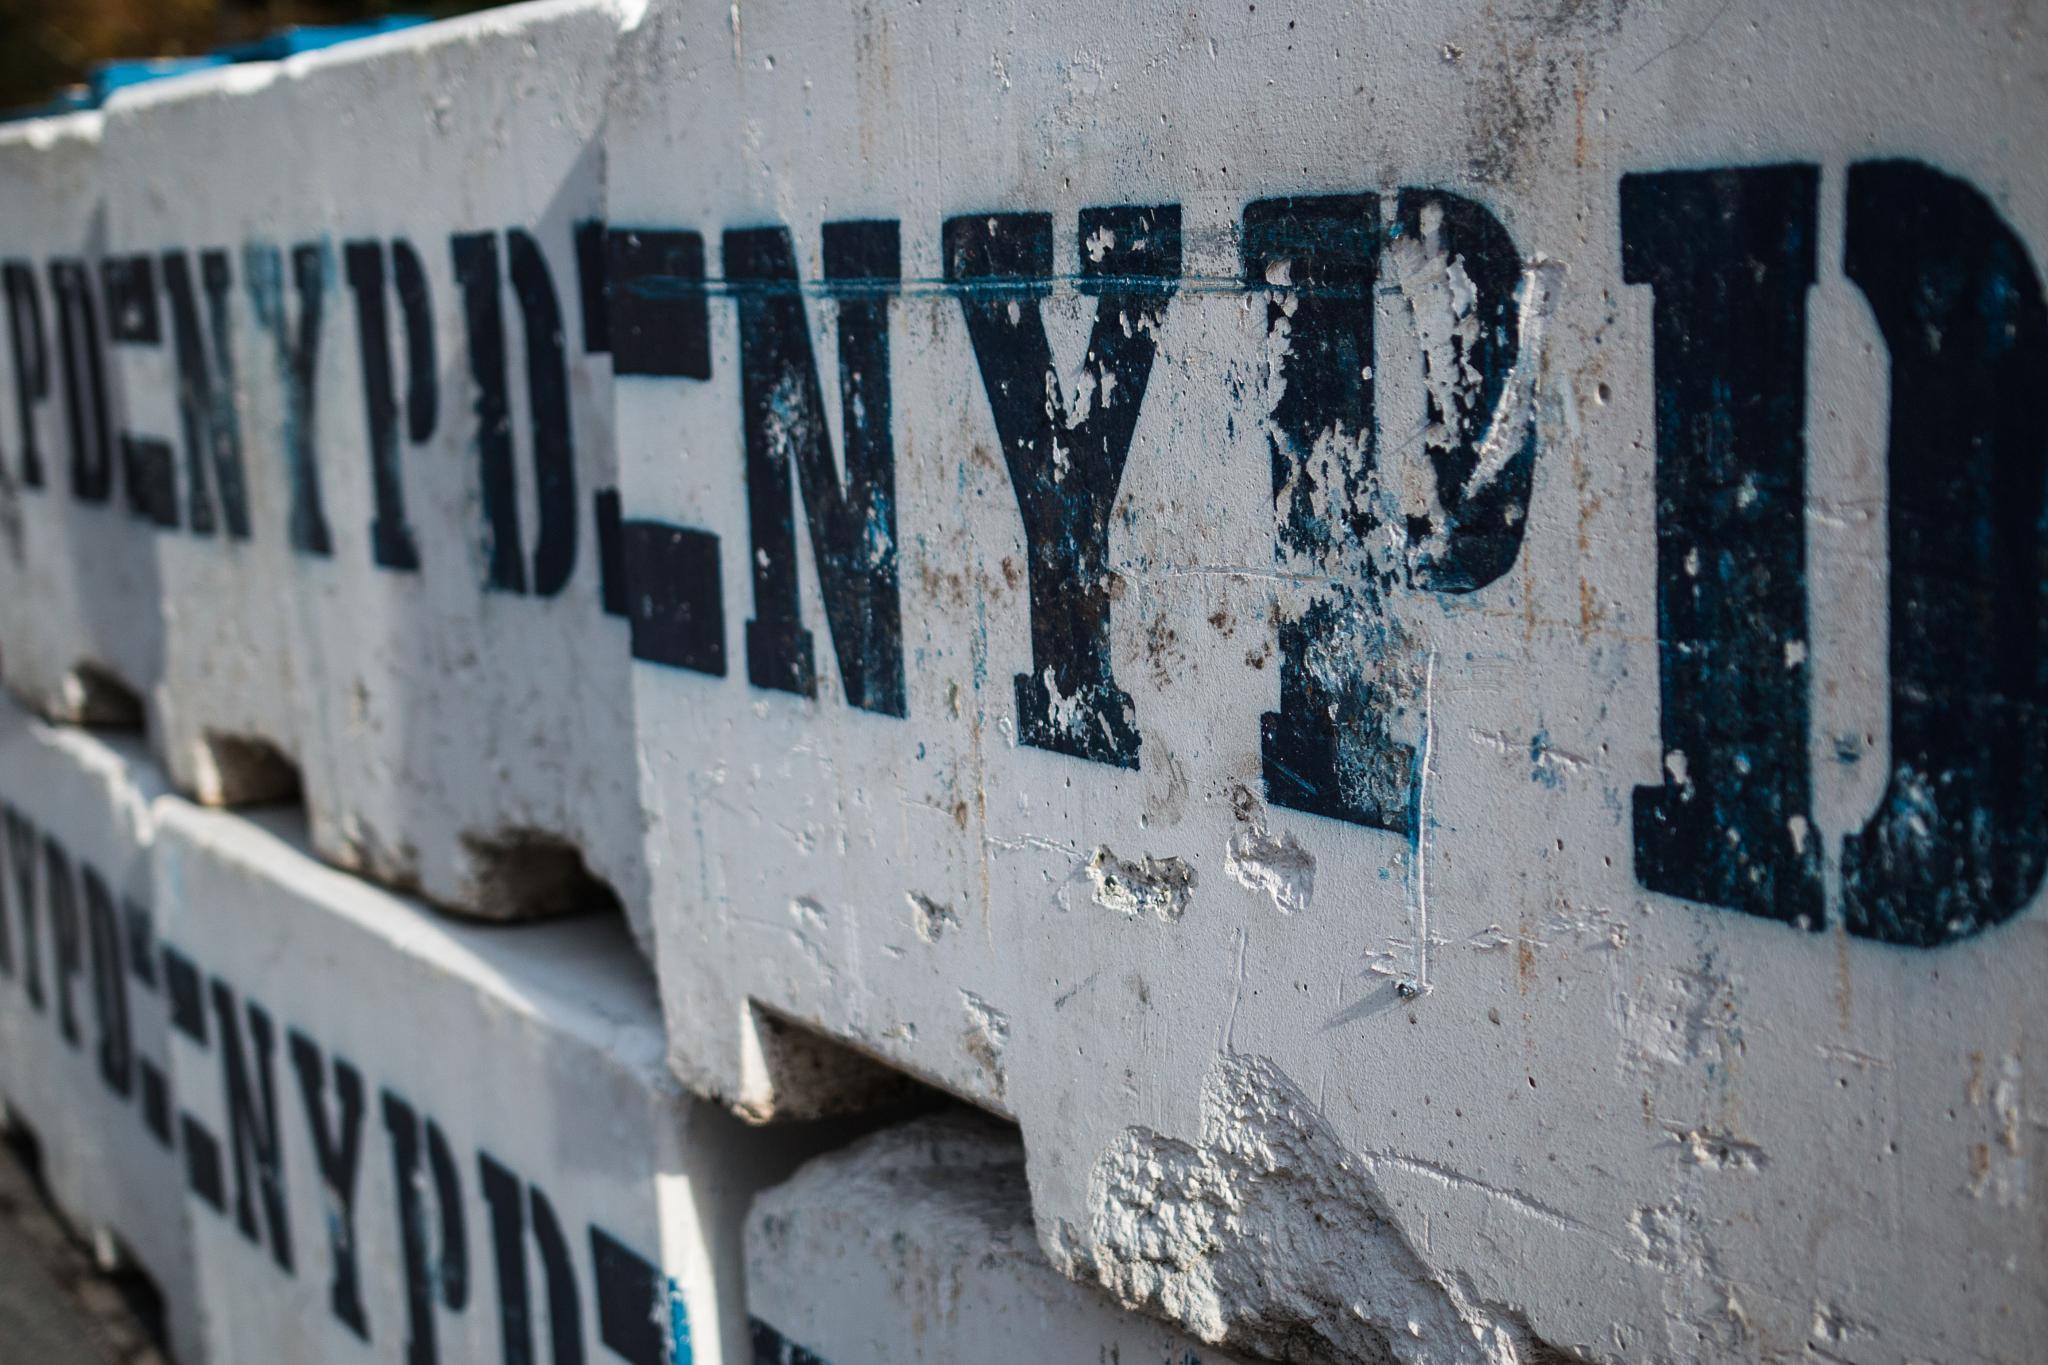 NYPD Blockade by Gareth Sawbridge